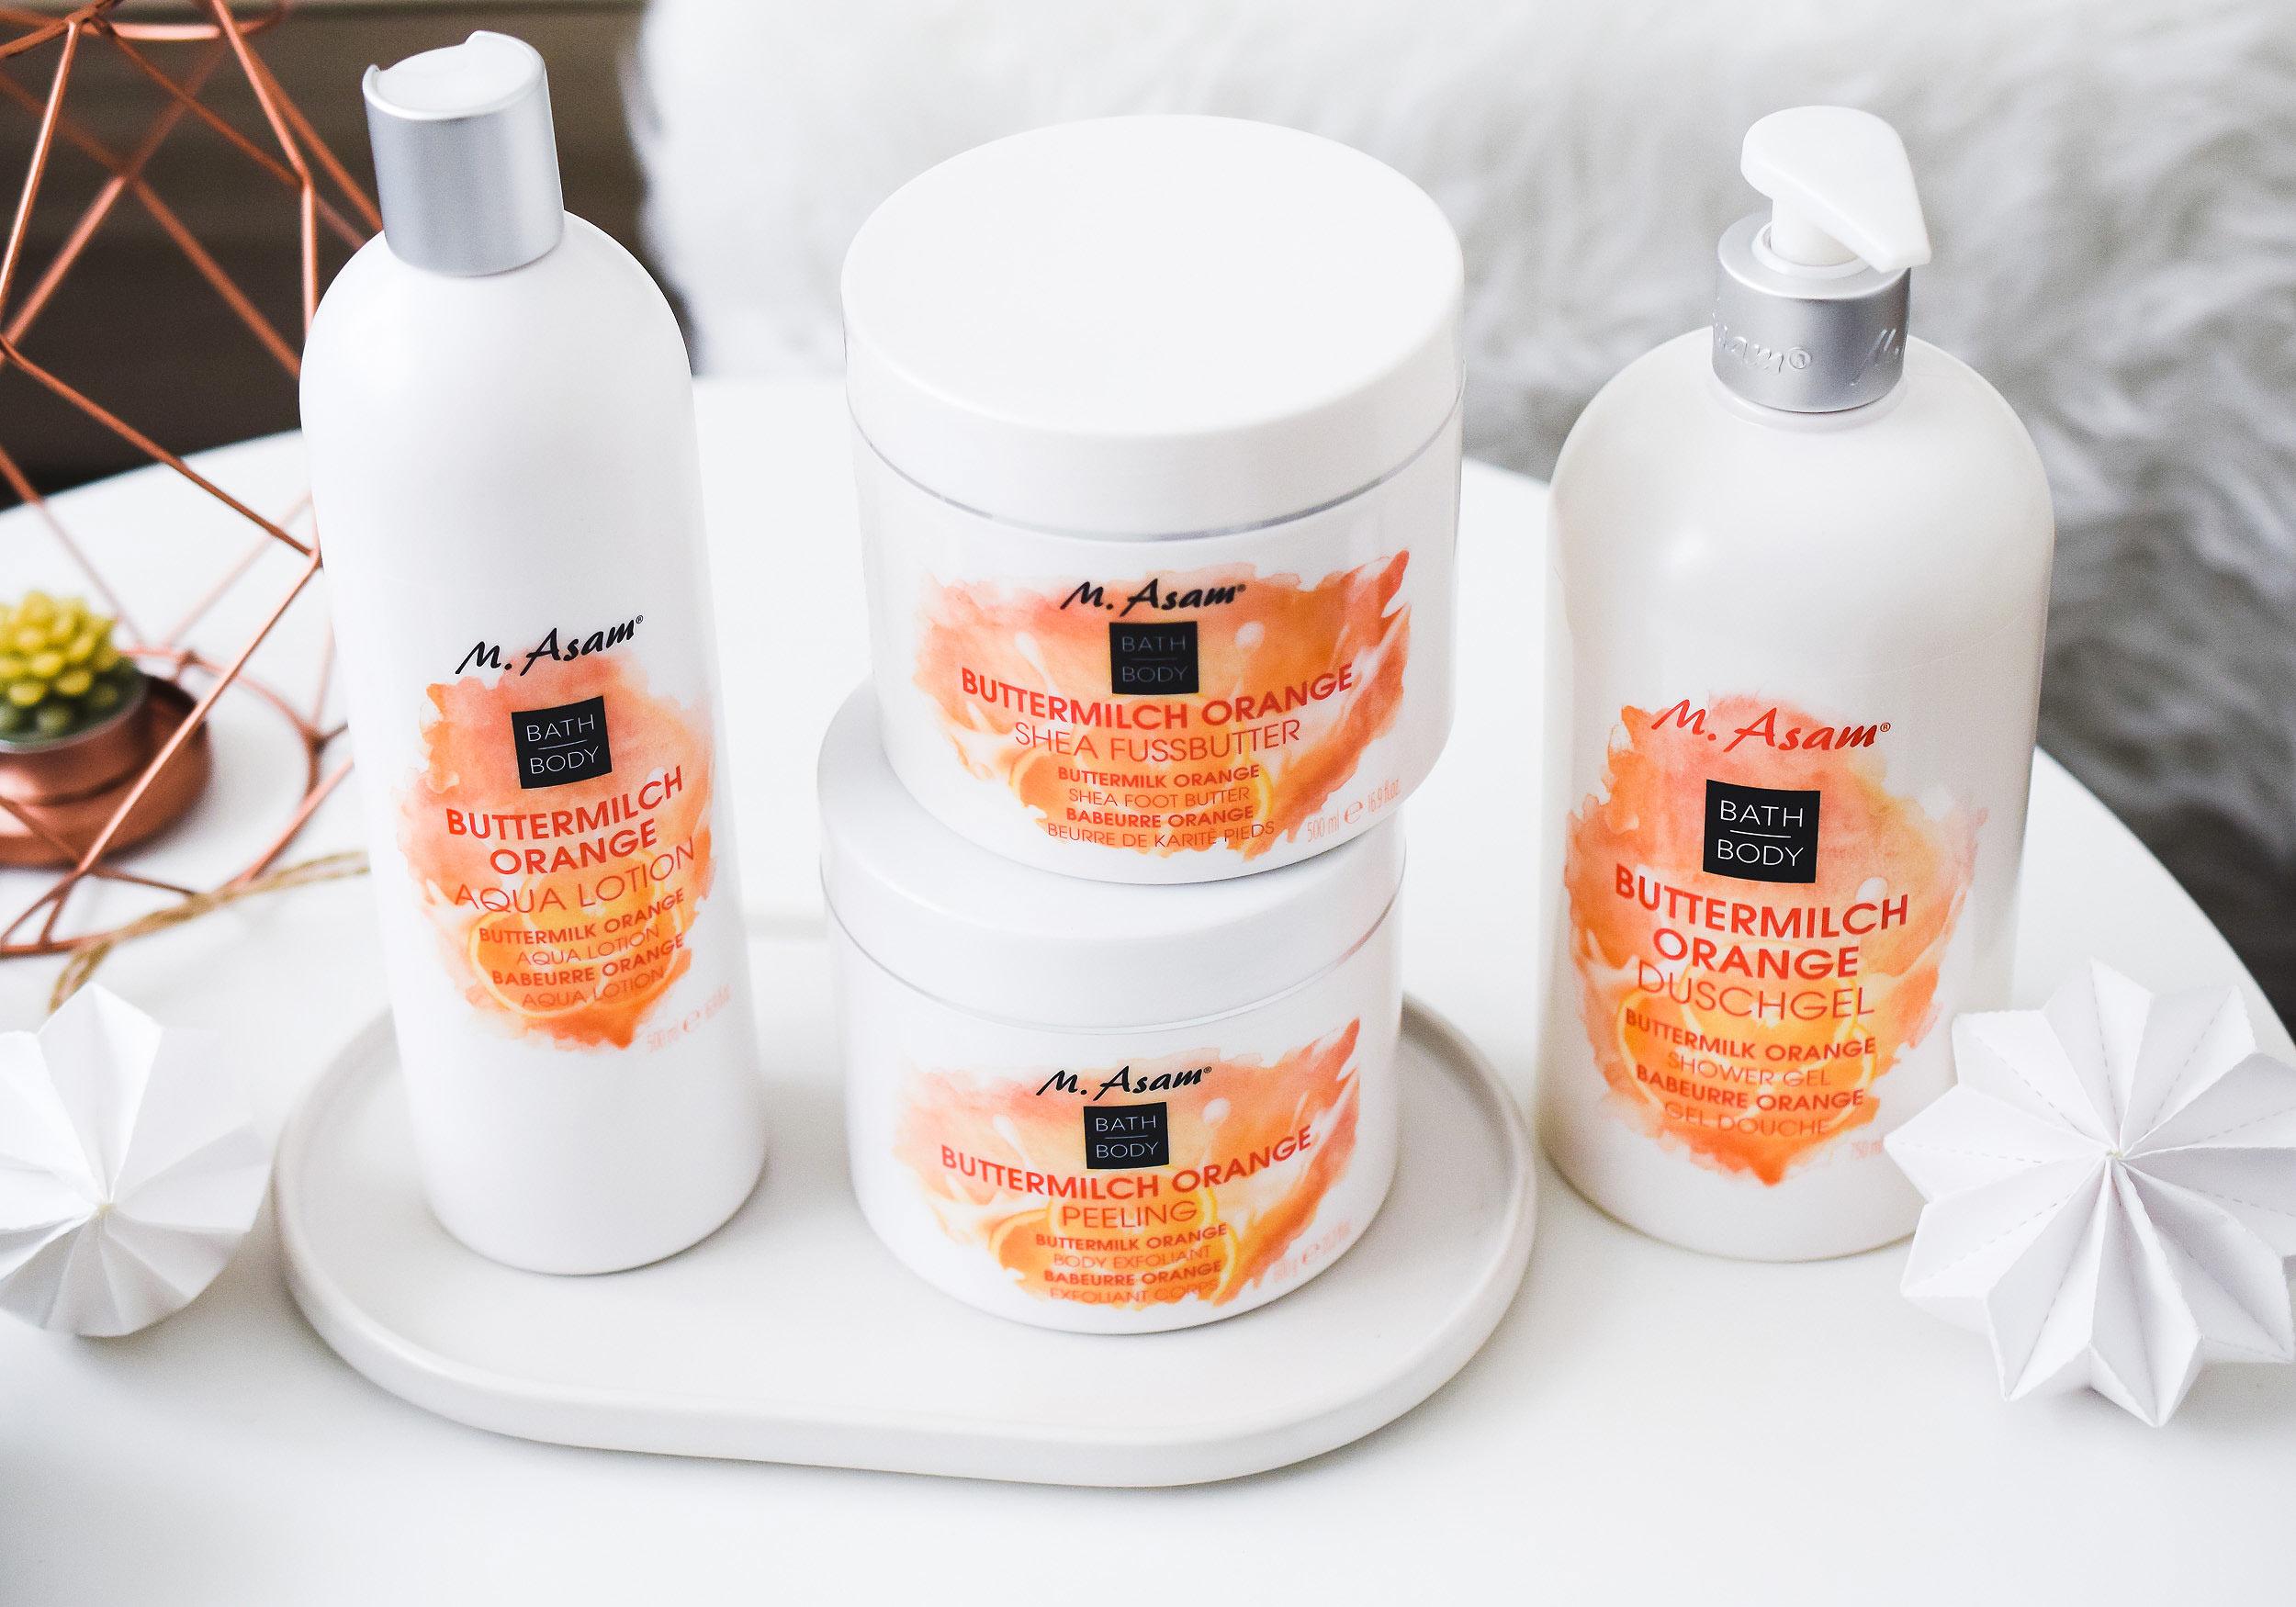 M. ASAM BATH & BODY Buttermilch Orange Hautpflege